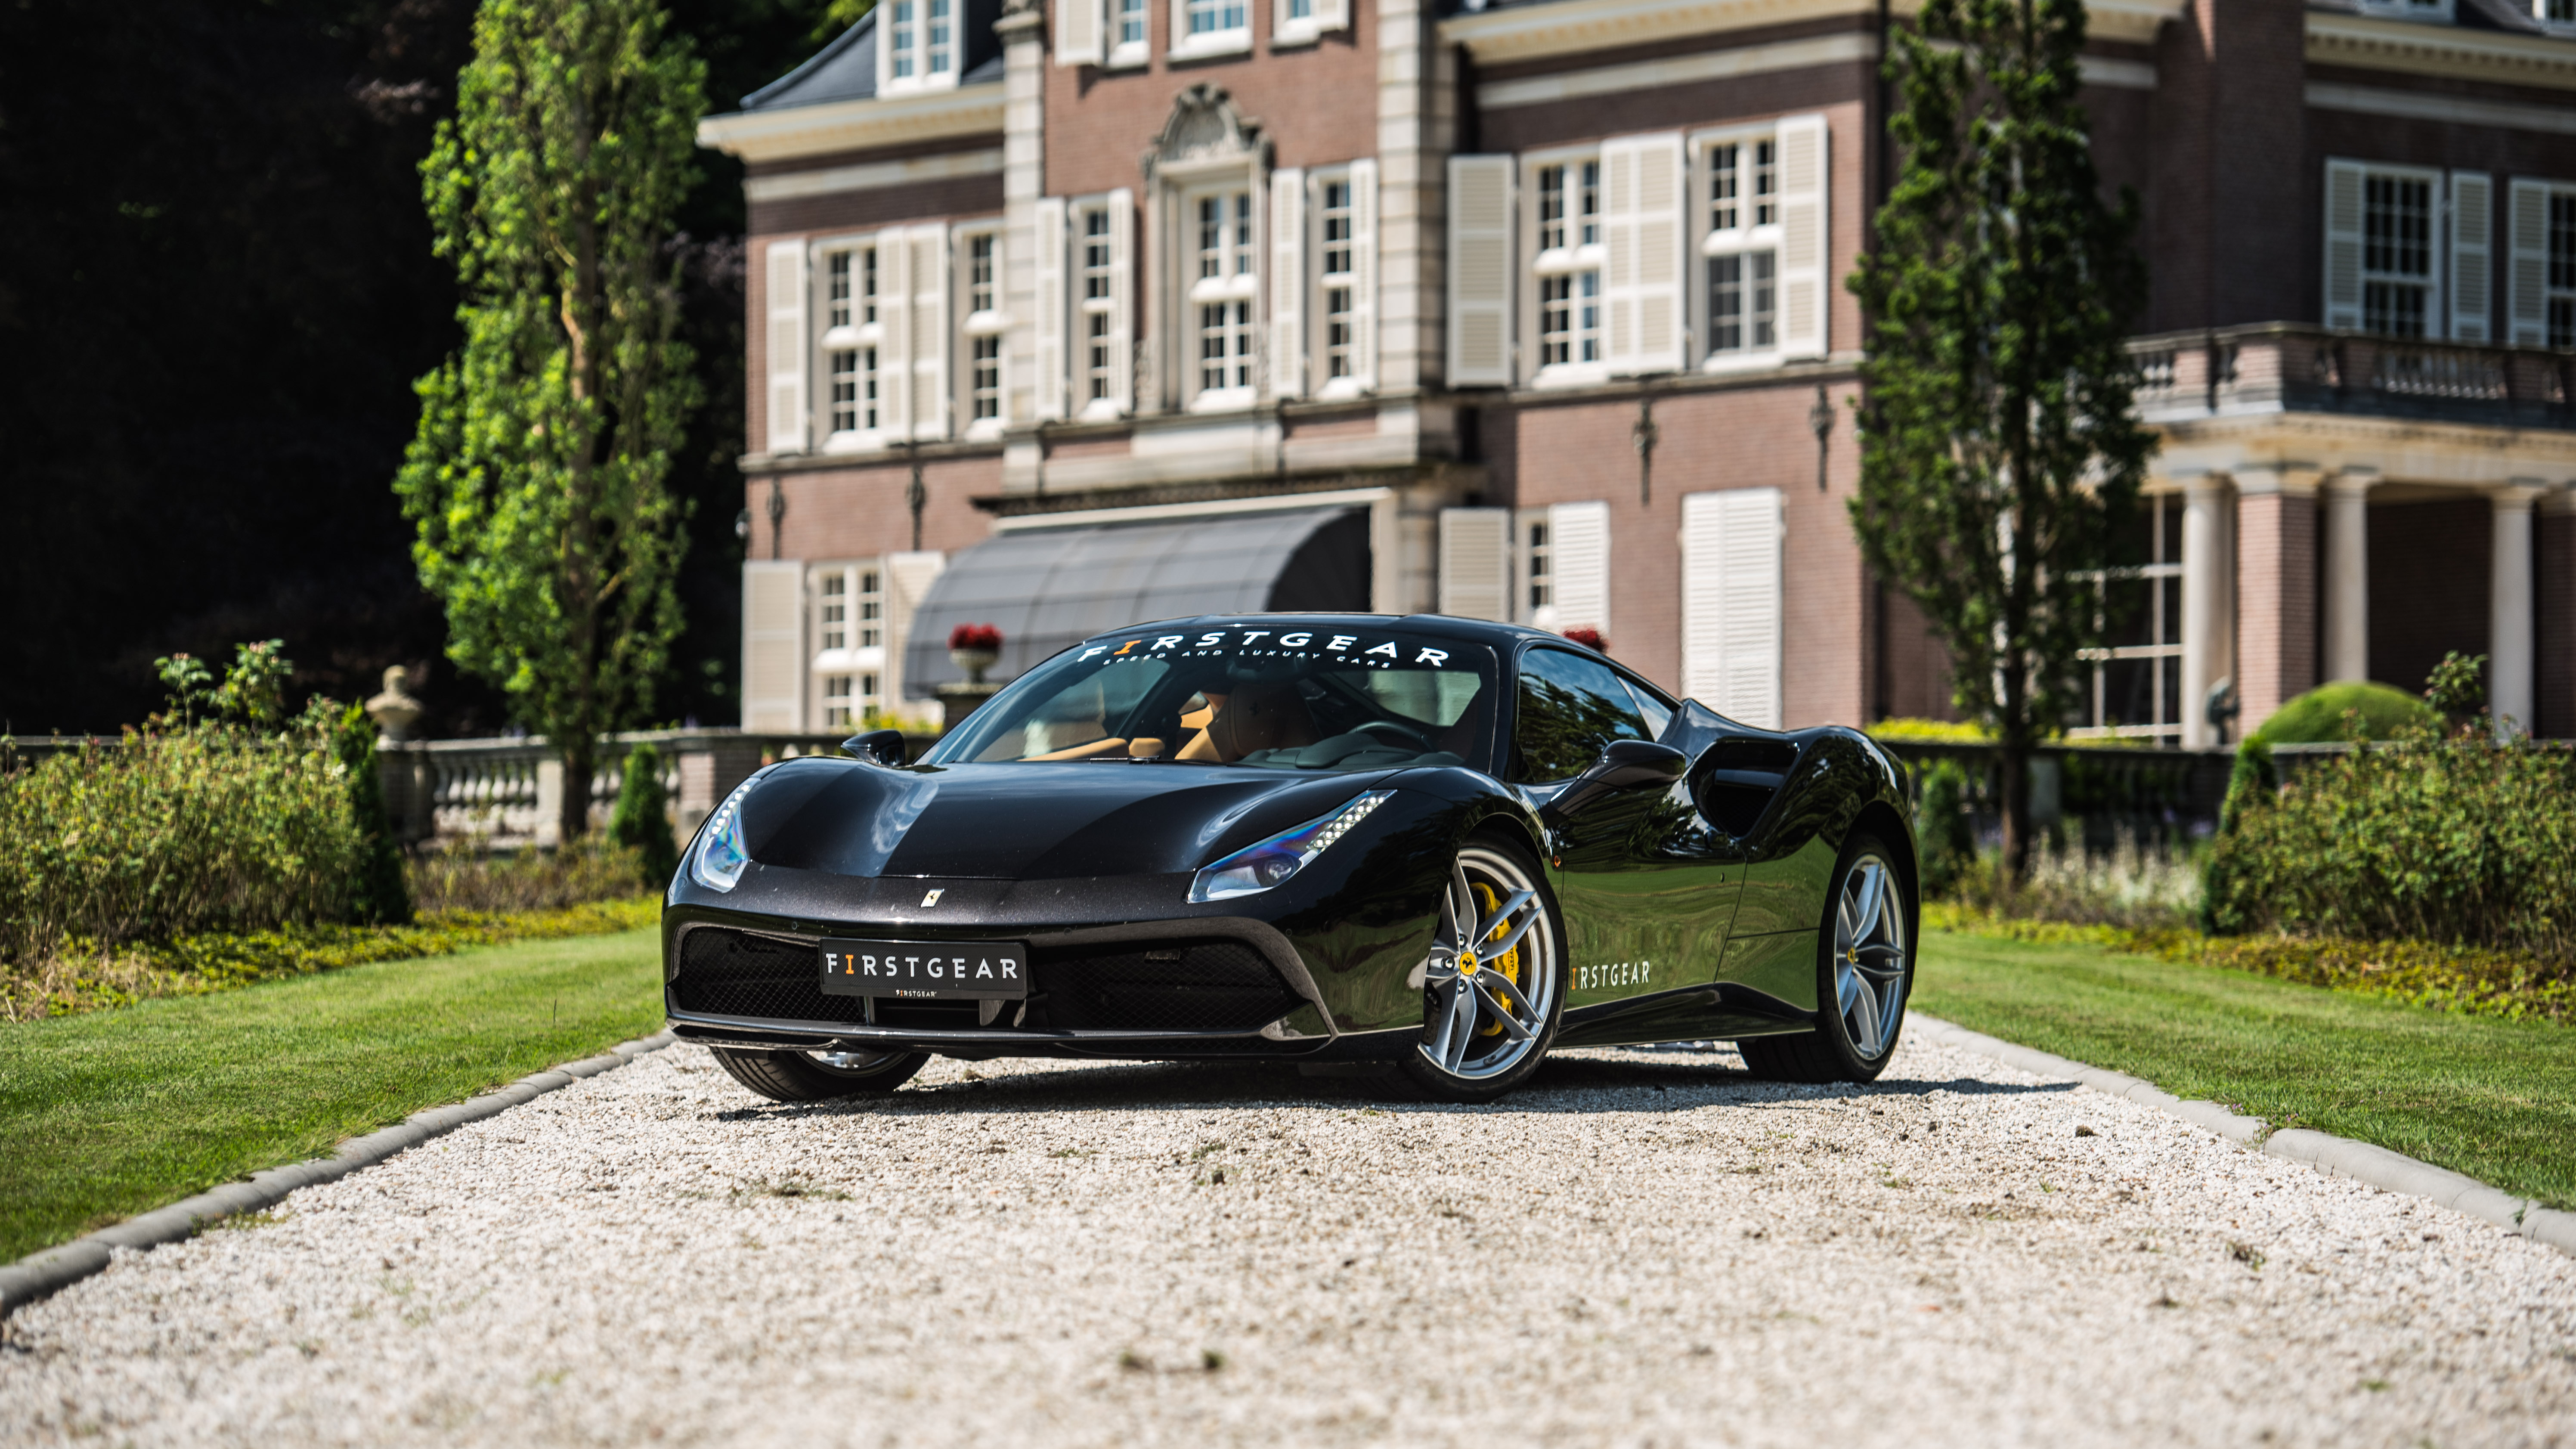 Ferrari 488 GTB | Hartvoorautos.nl